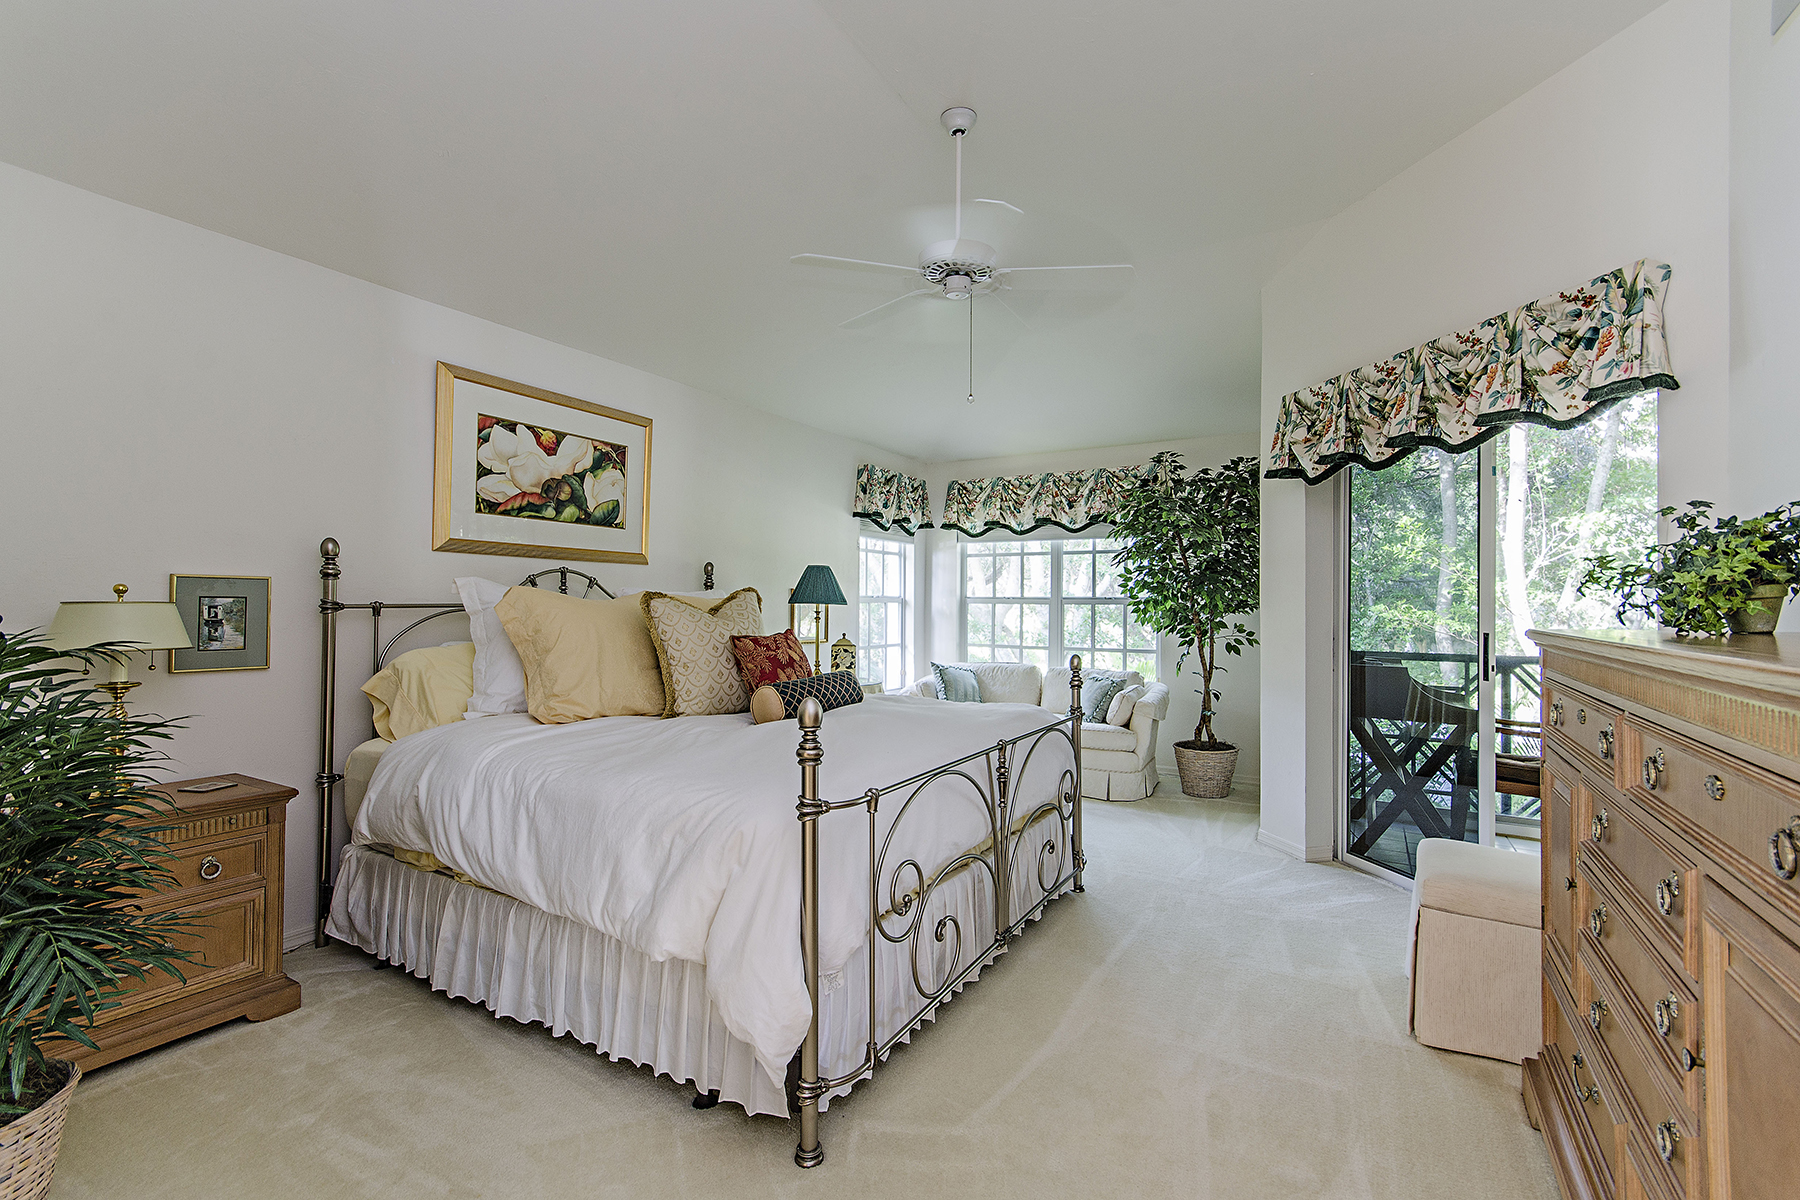 Additional photo for property listing at SAN MARINO  PELICAN BAY 6855  San Marino Dr 201B,  Naples, Florida 34108 United States